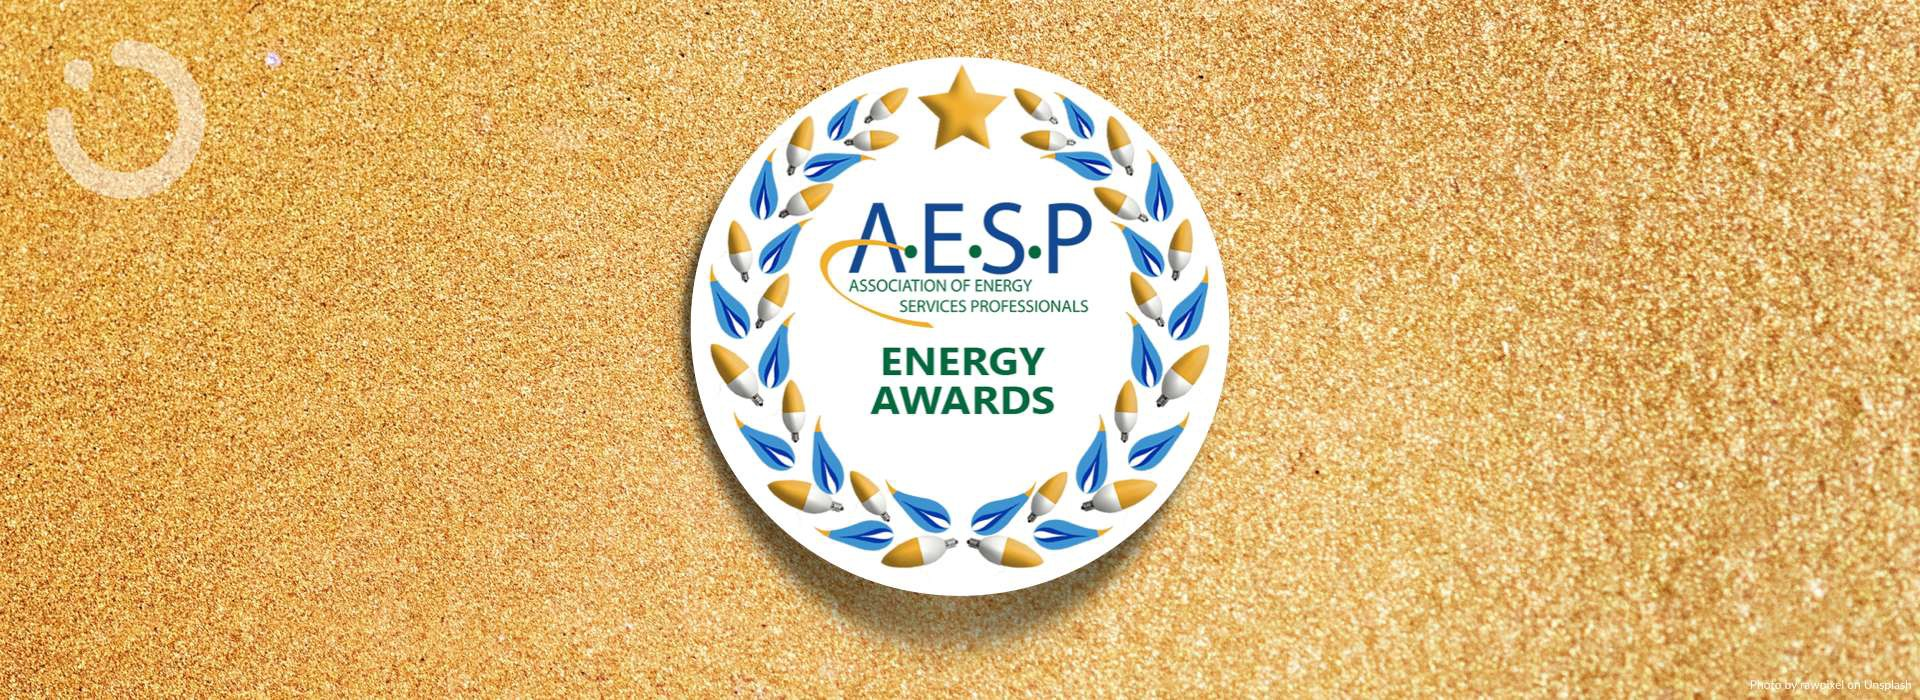 Enervee Awarded for Successful Utility Market Transformation Program